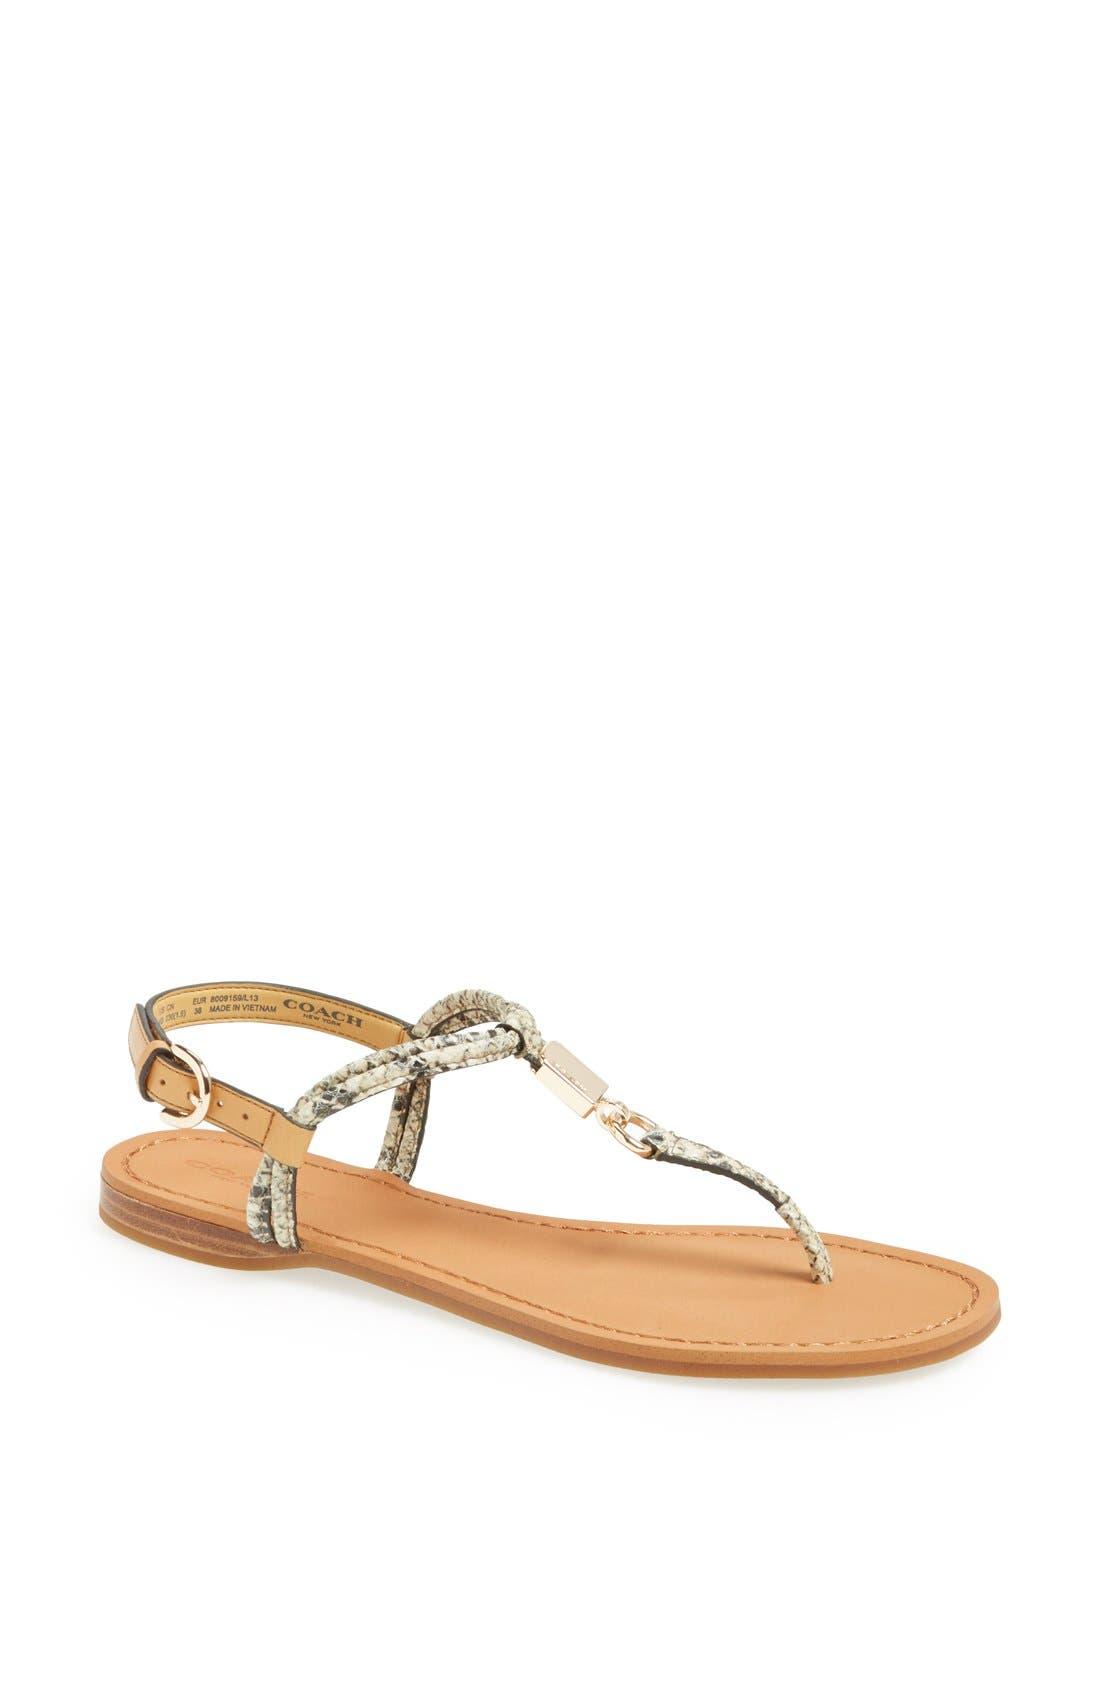 Main Image - COACH 'Charleen' Leather Thong Sandal